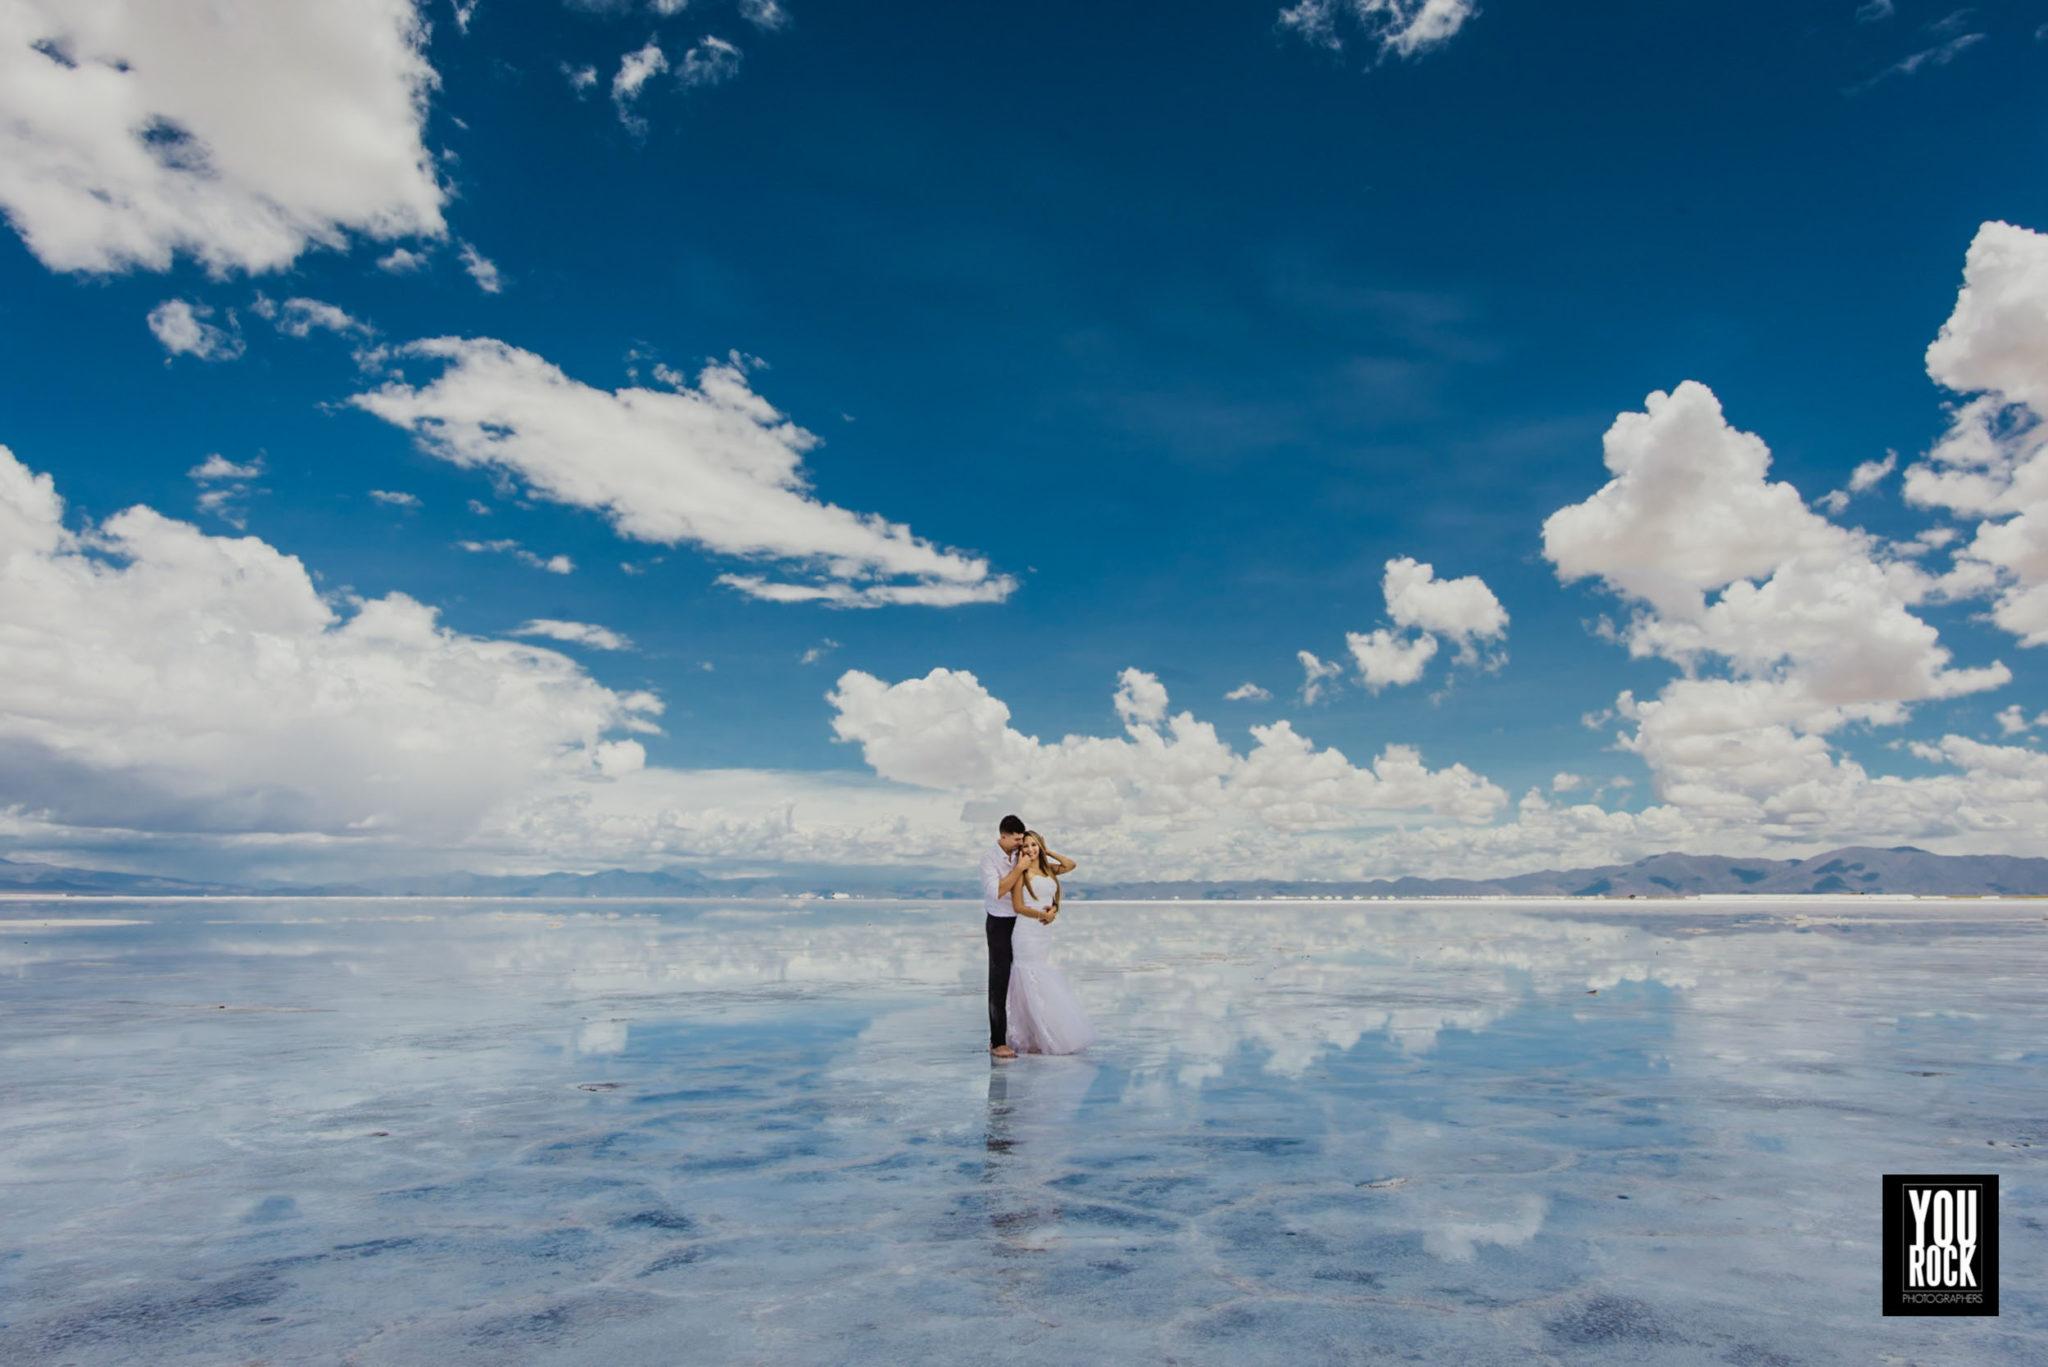 award you rock photographers - matias fernandez - phmatiasfernandez - los mejores fotógrafos de bodas